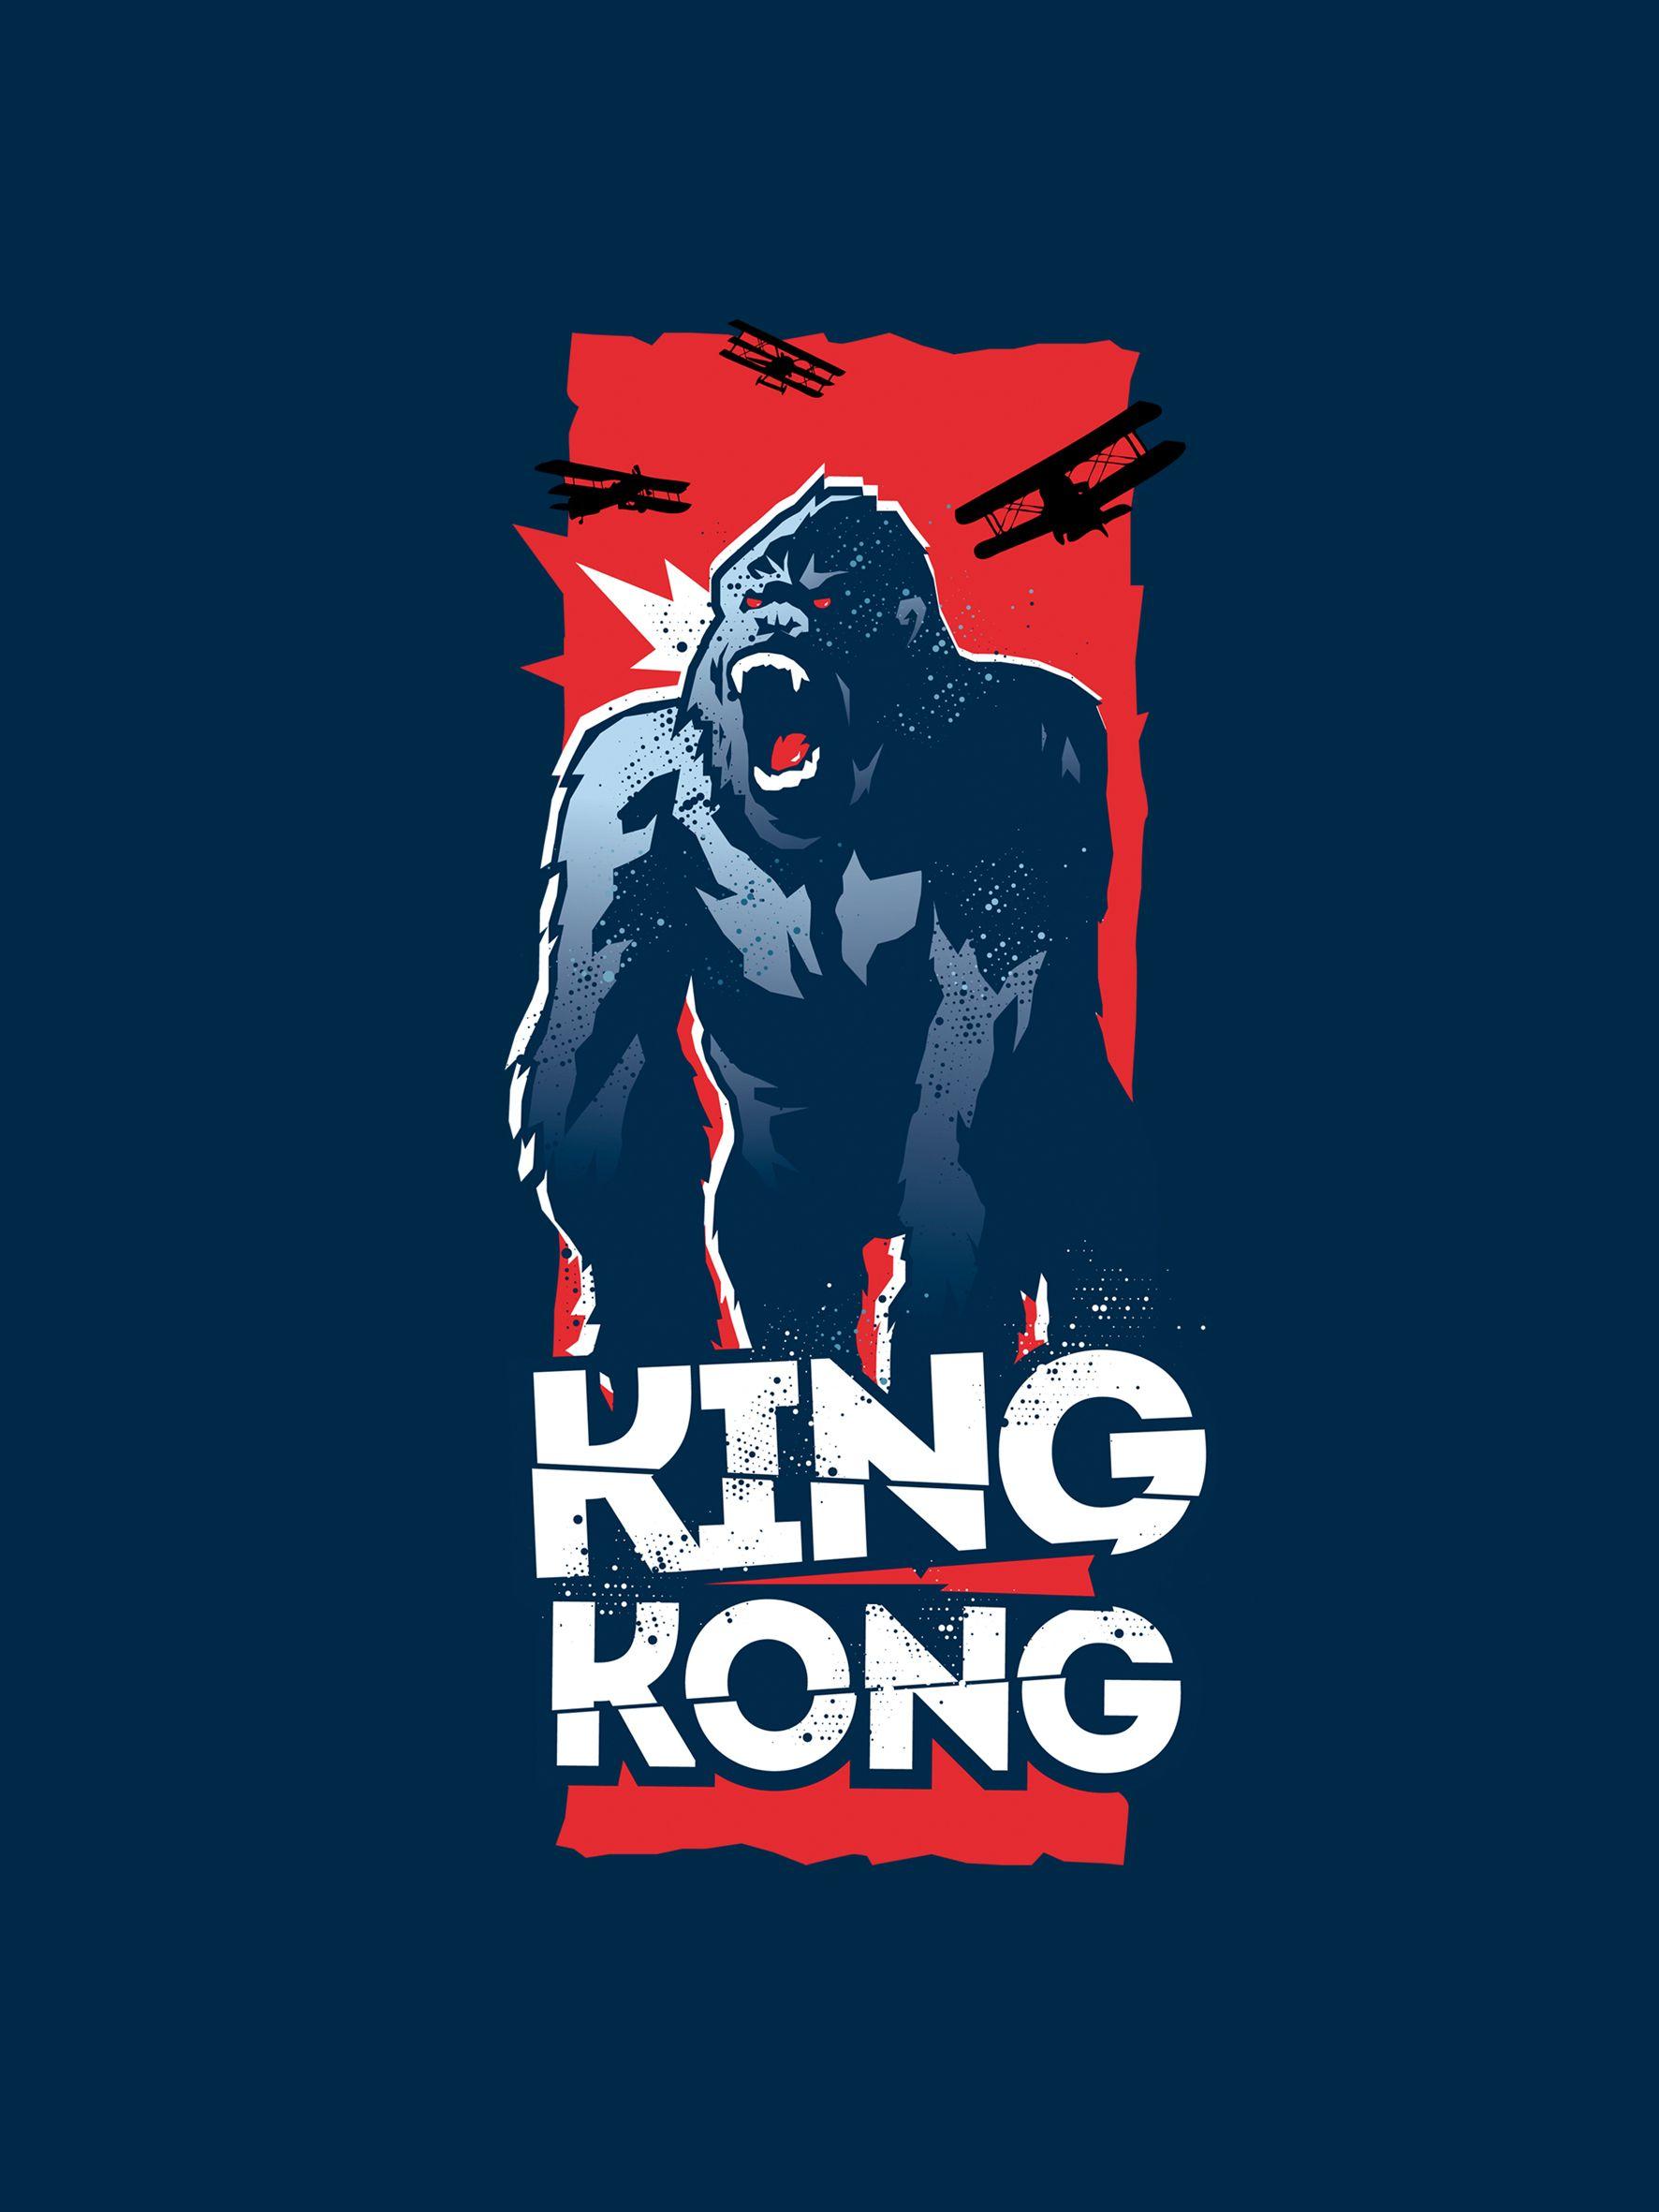 King kong fatso grafix illustration pinterest king kong king and logo design - King kong design ...